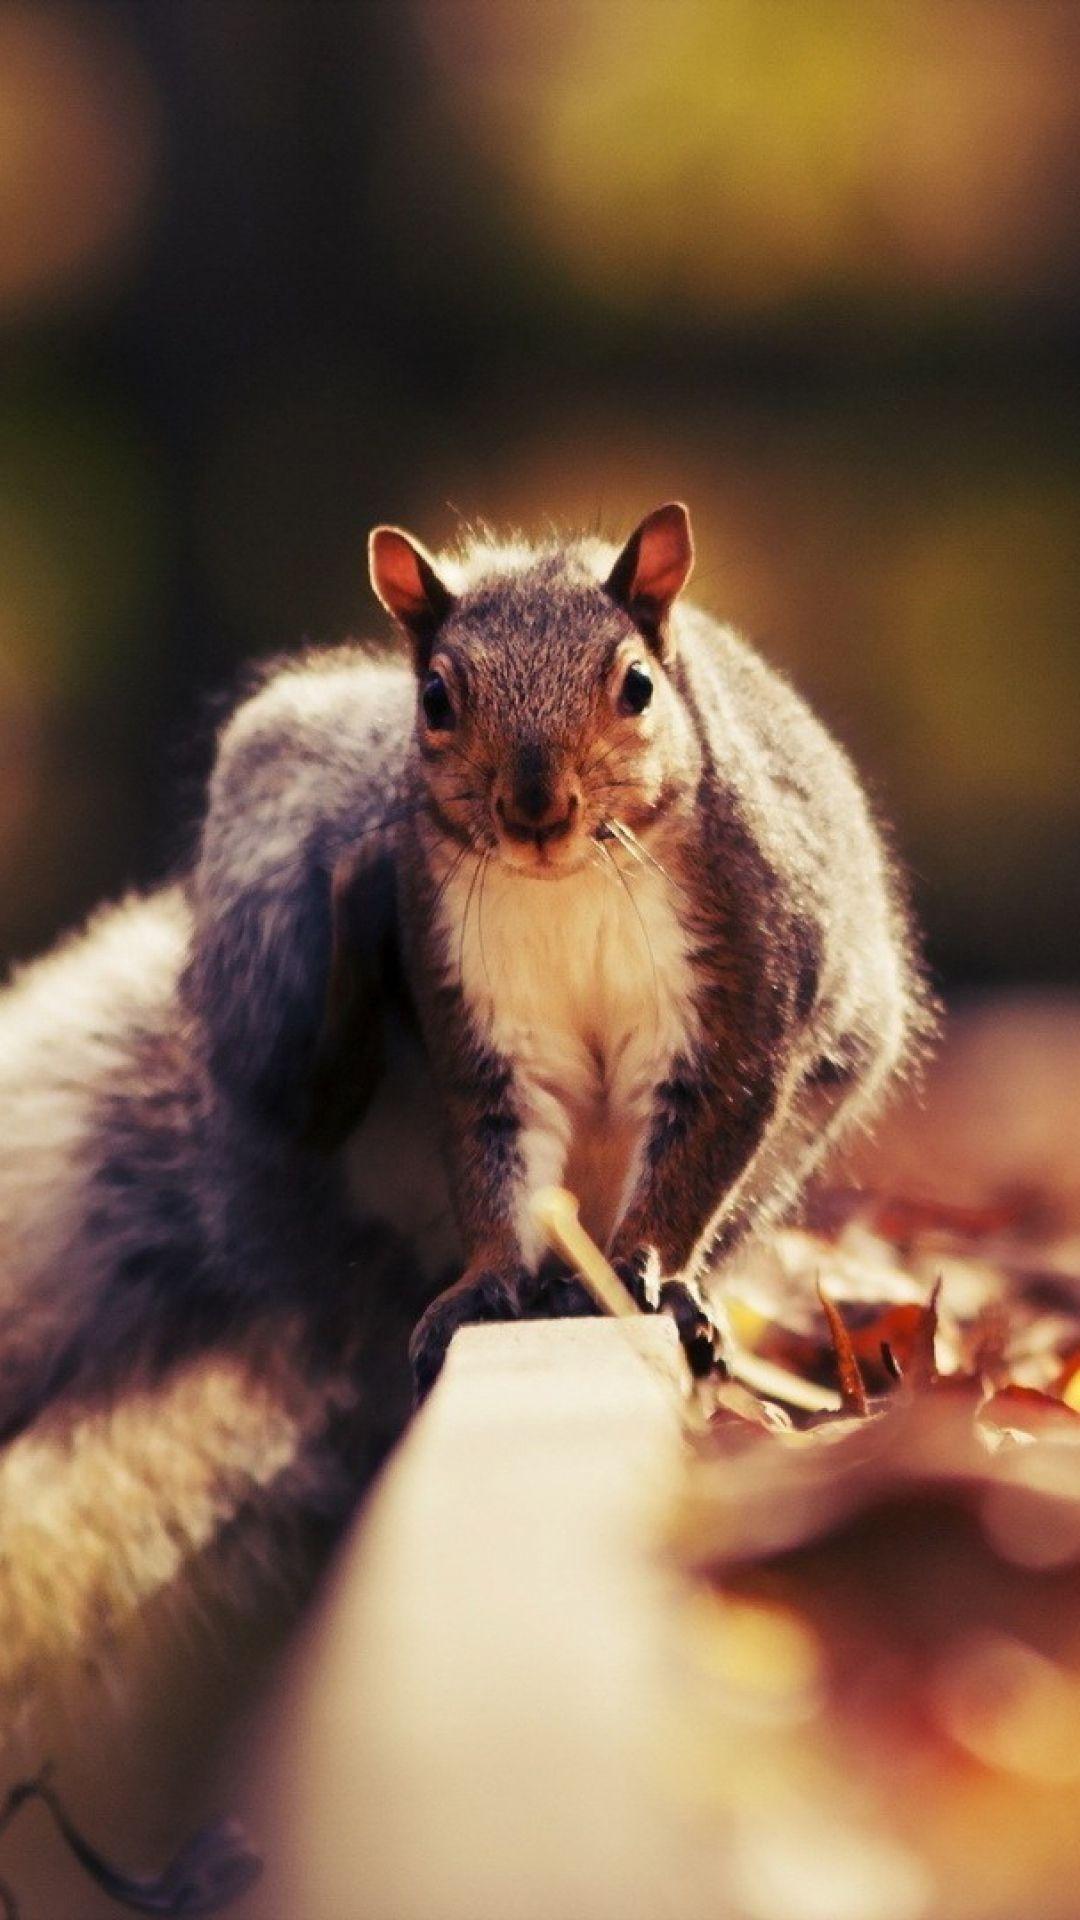 https://wallpaperscraft.com/download/squirrel_leaves_autumn_animal_66502/1080x1920